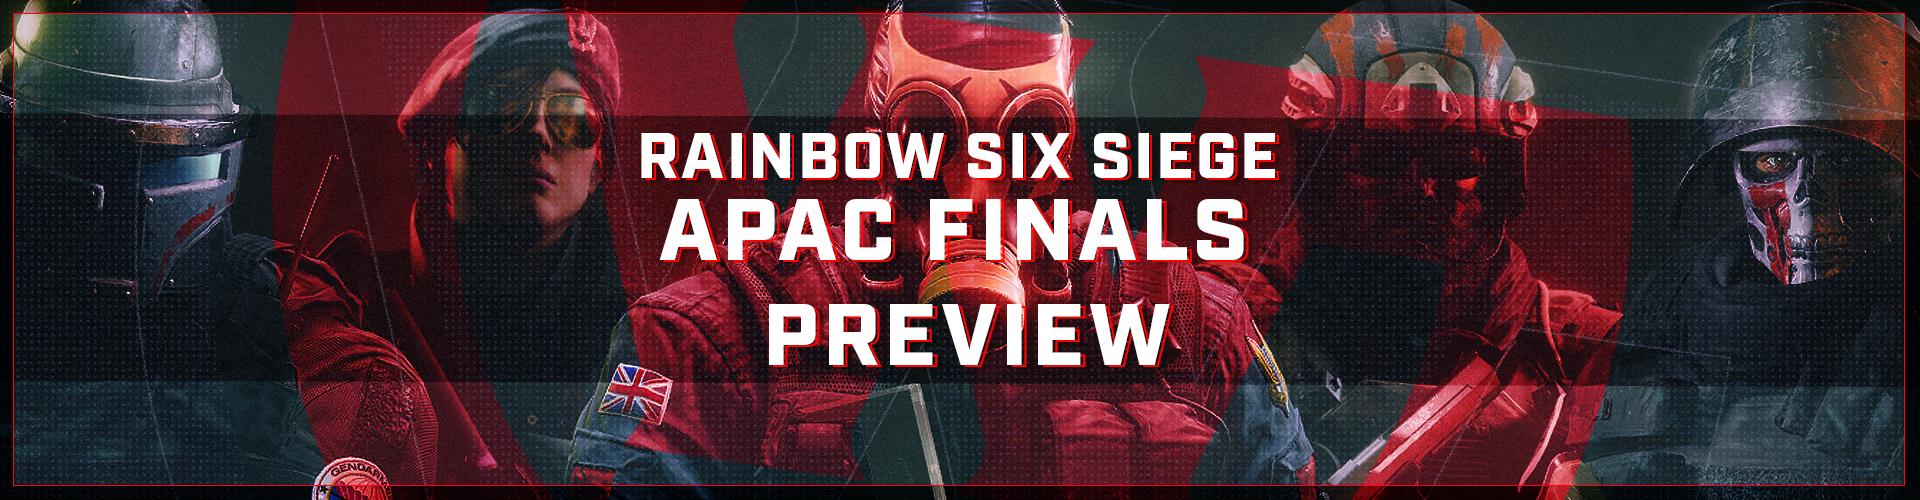 R6 APAC Finals Preview